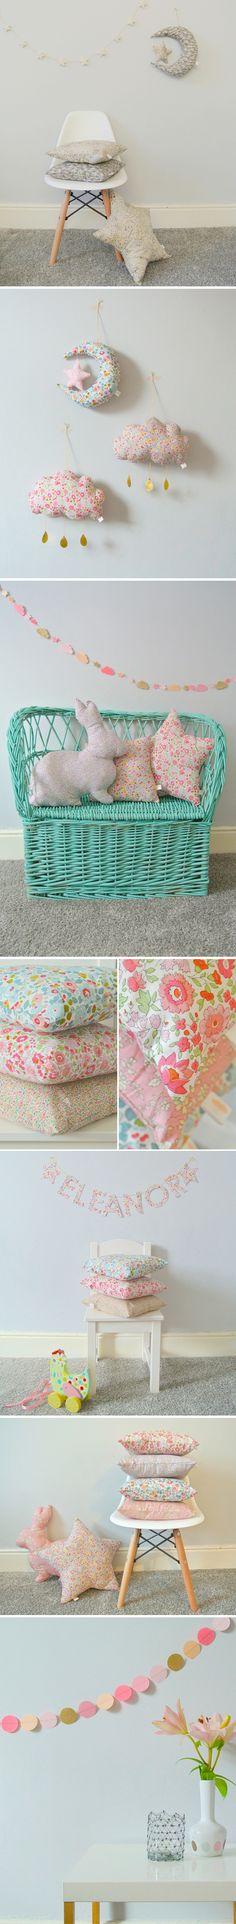 Beautiful pillows, garlands and softies for a kids room or nursery. Little Cloud | #decor #kids #nursery